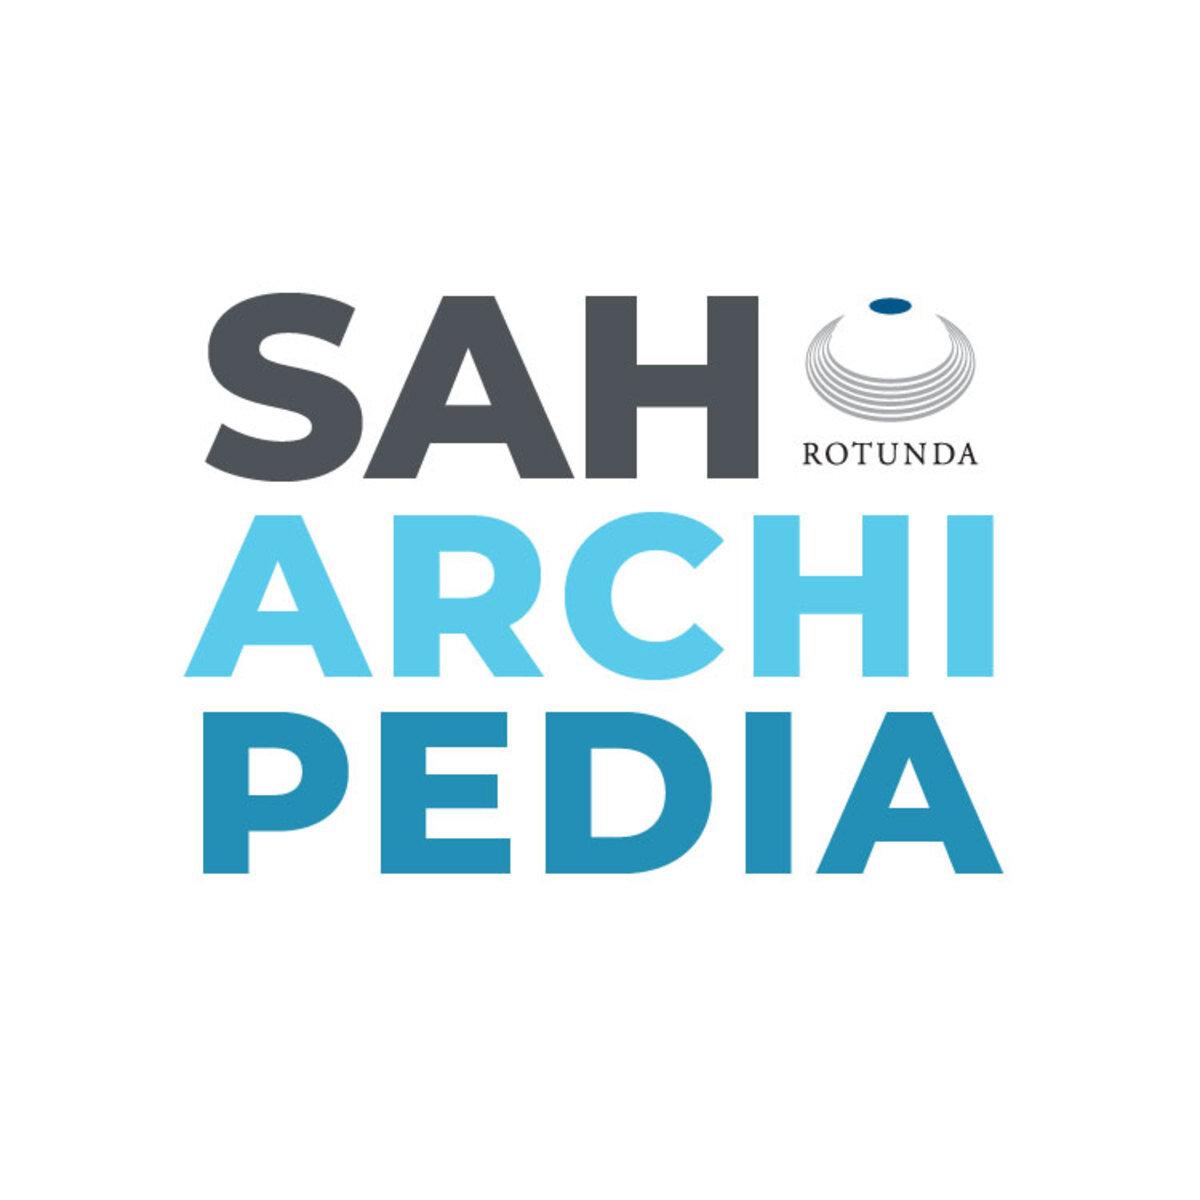 saharchipedia_small.jpg